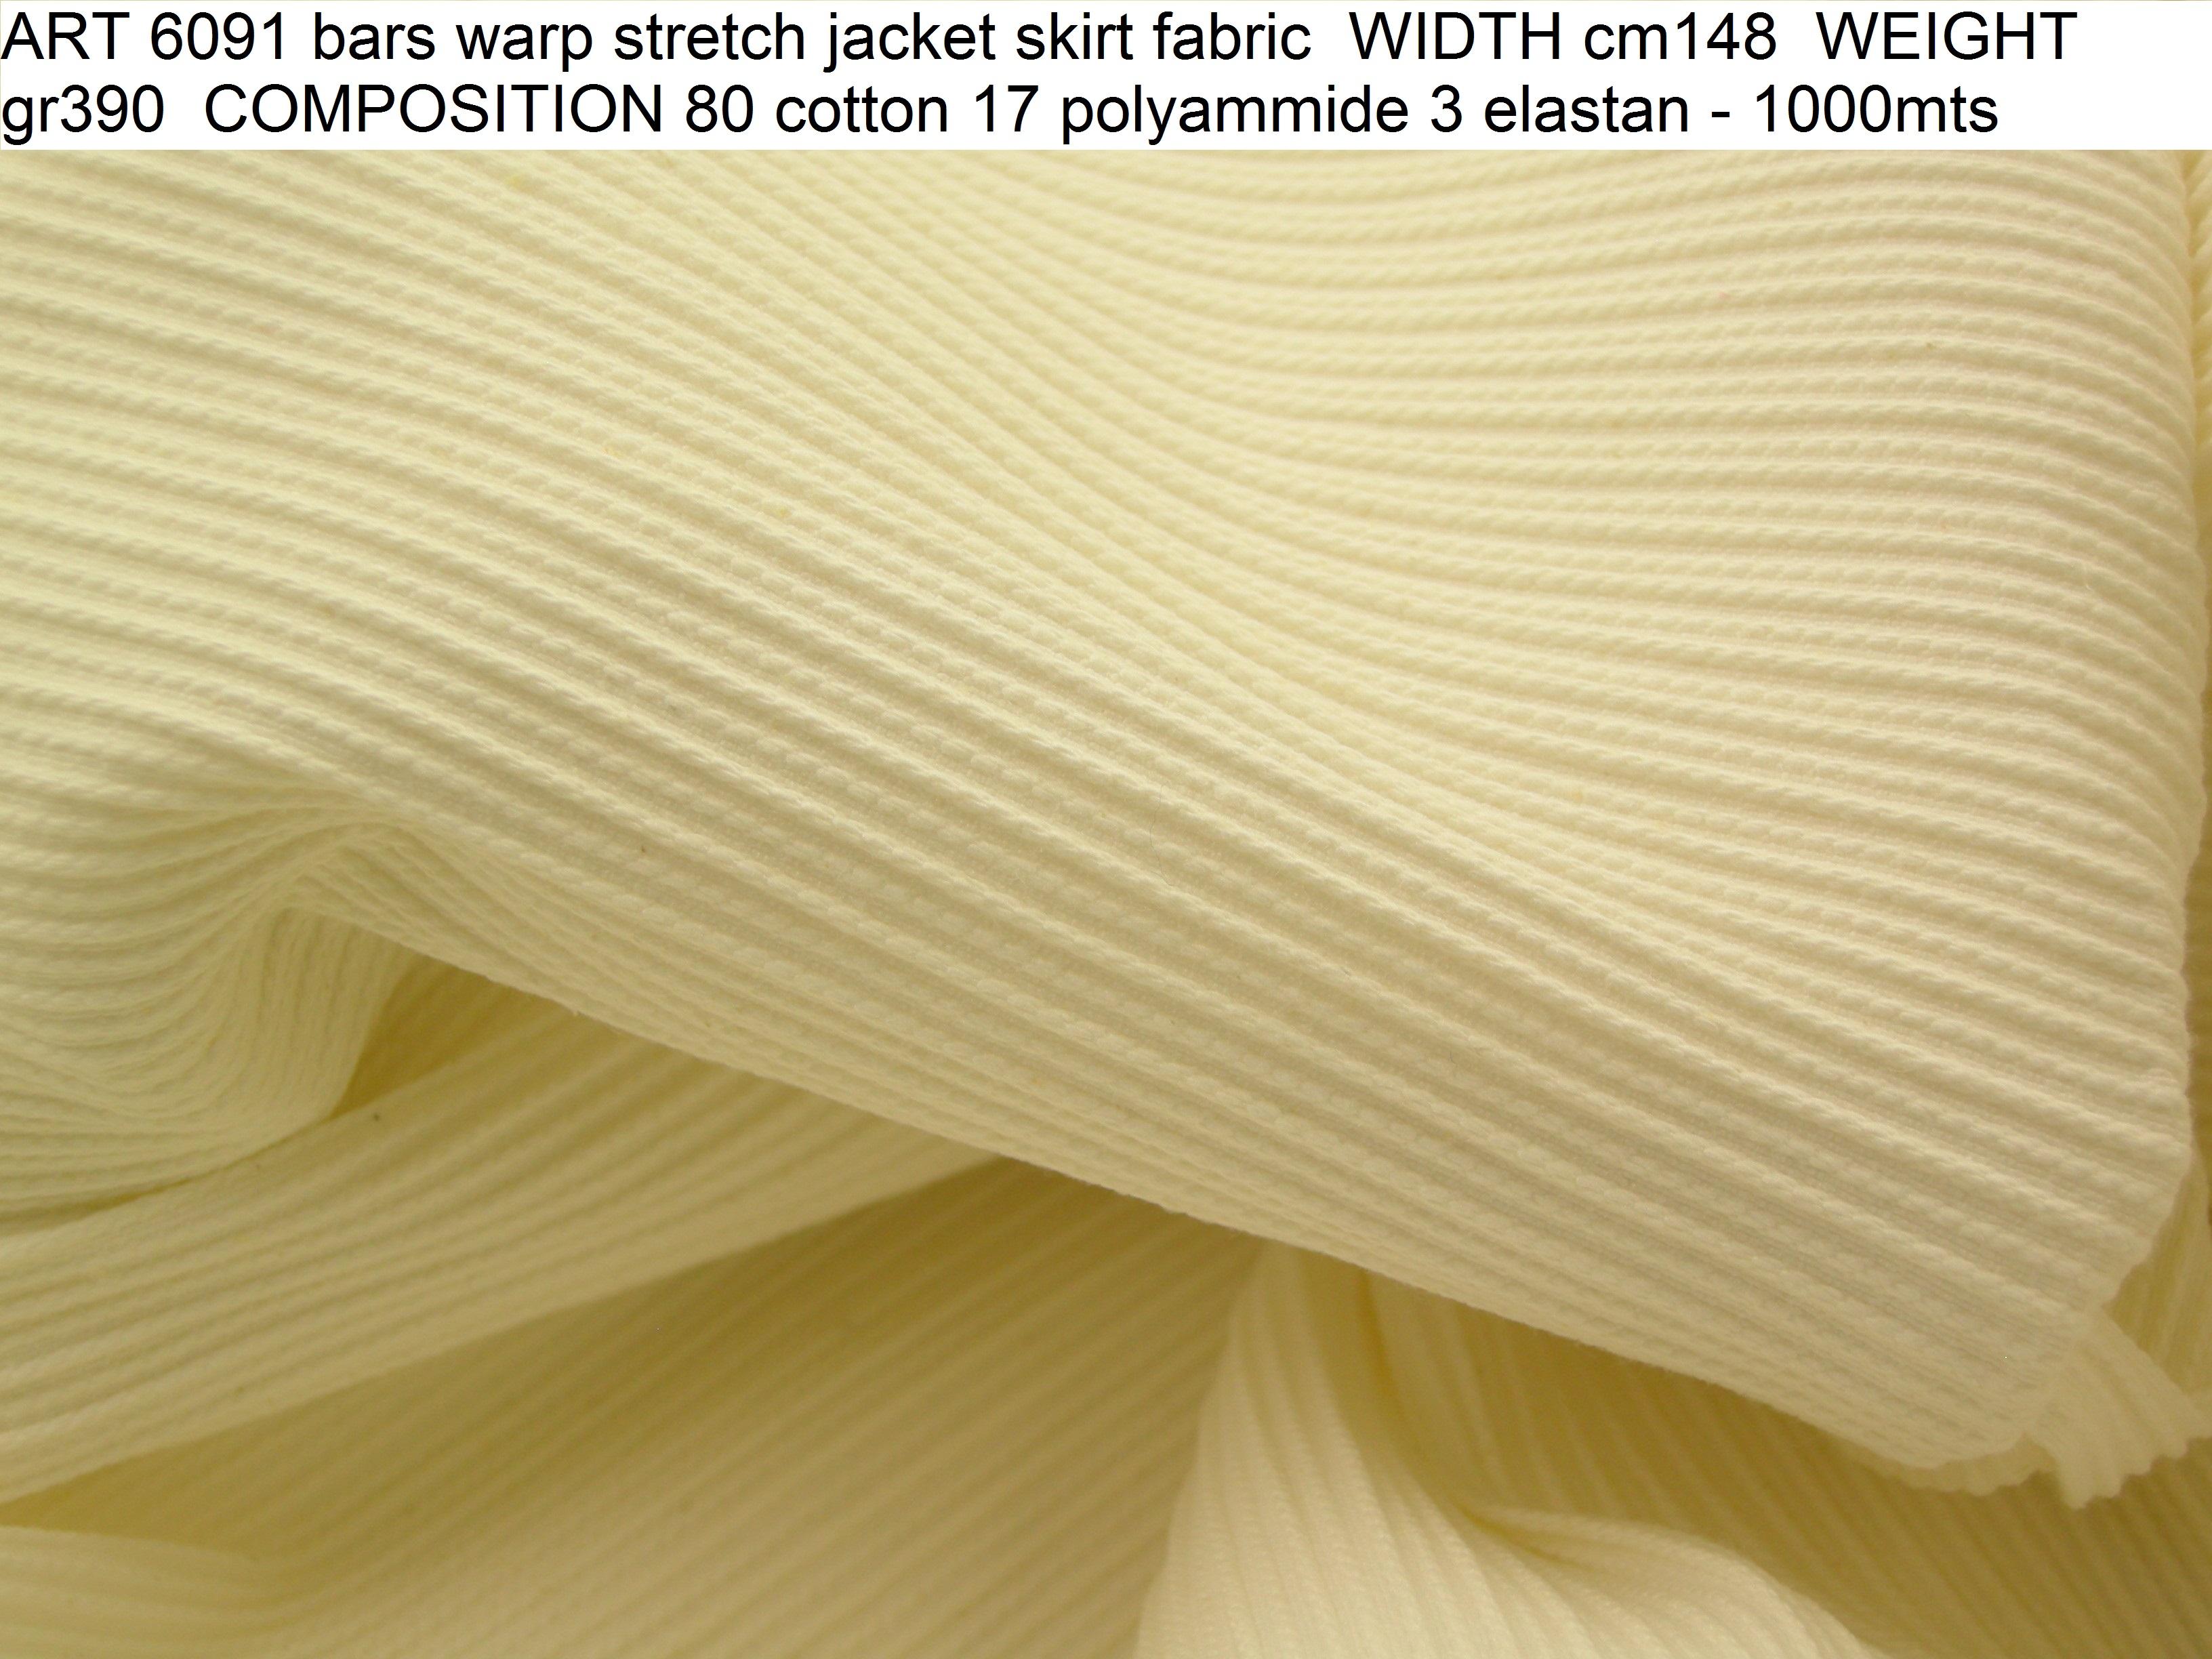 ART 6091 bars warp stretch jacket skirt fabric WIDTH cm148 WEIGHT gr390 COMPOSITION 80 cotton 17 polyammide 3 elastan - 1000mts